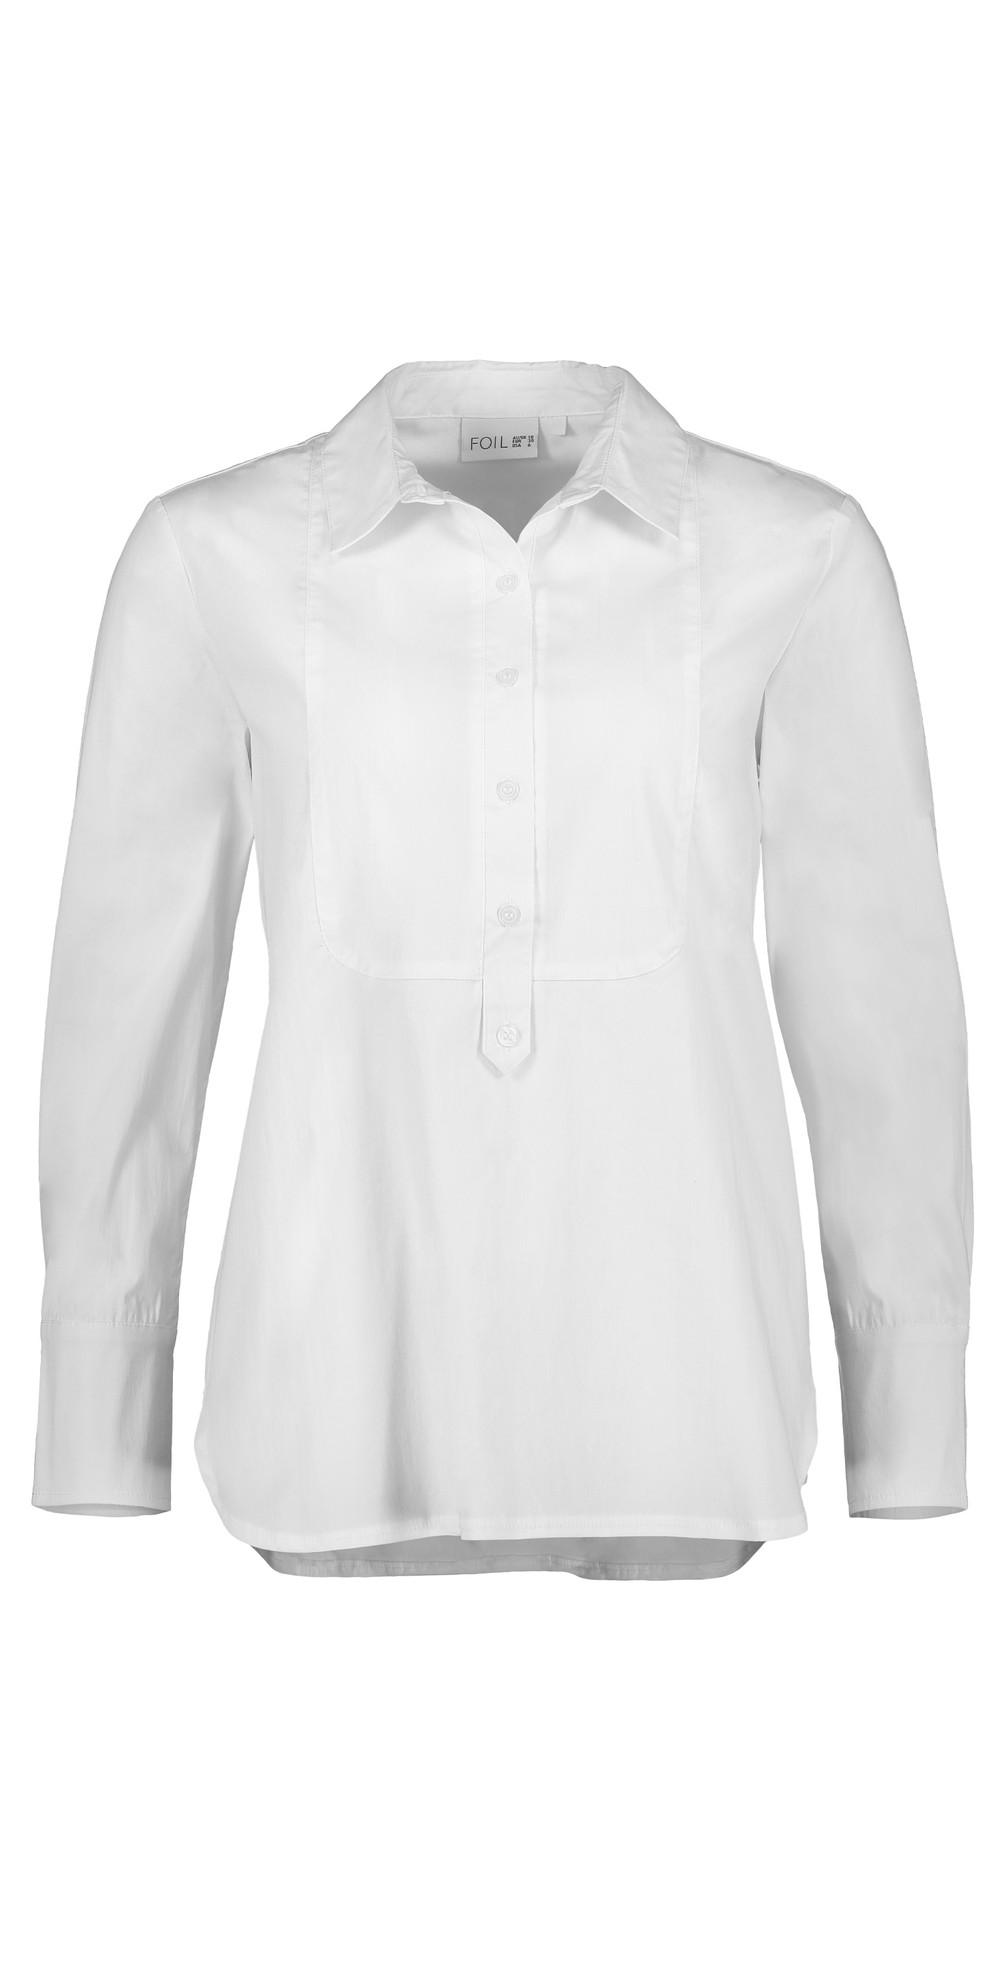 Tux Delight Shirt main image